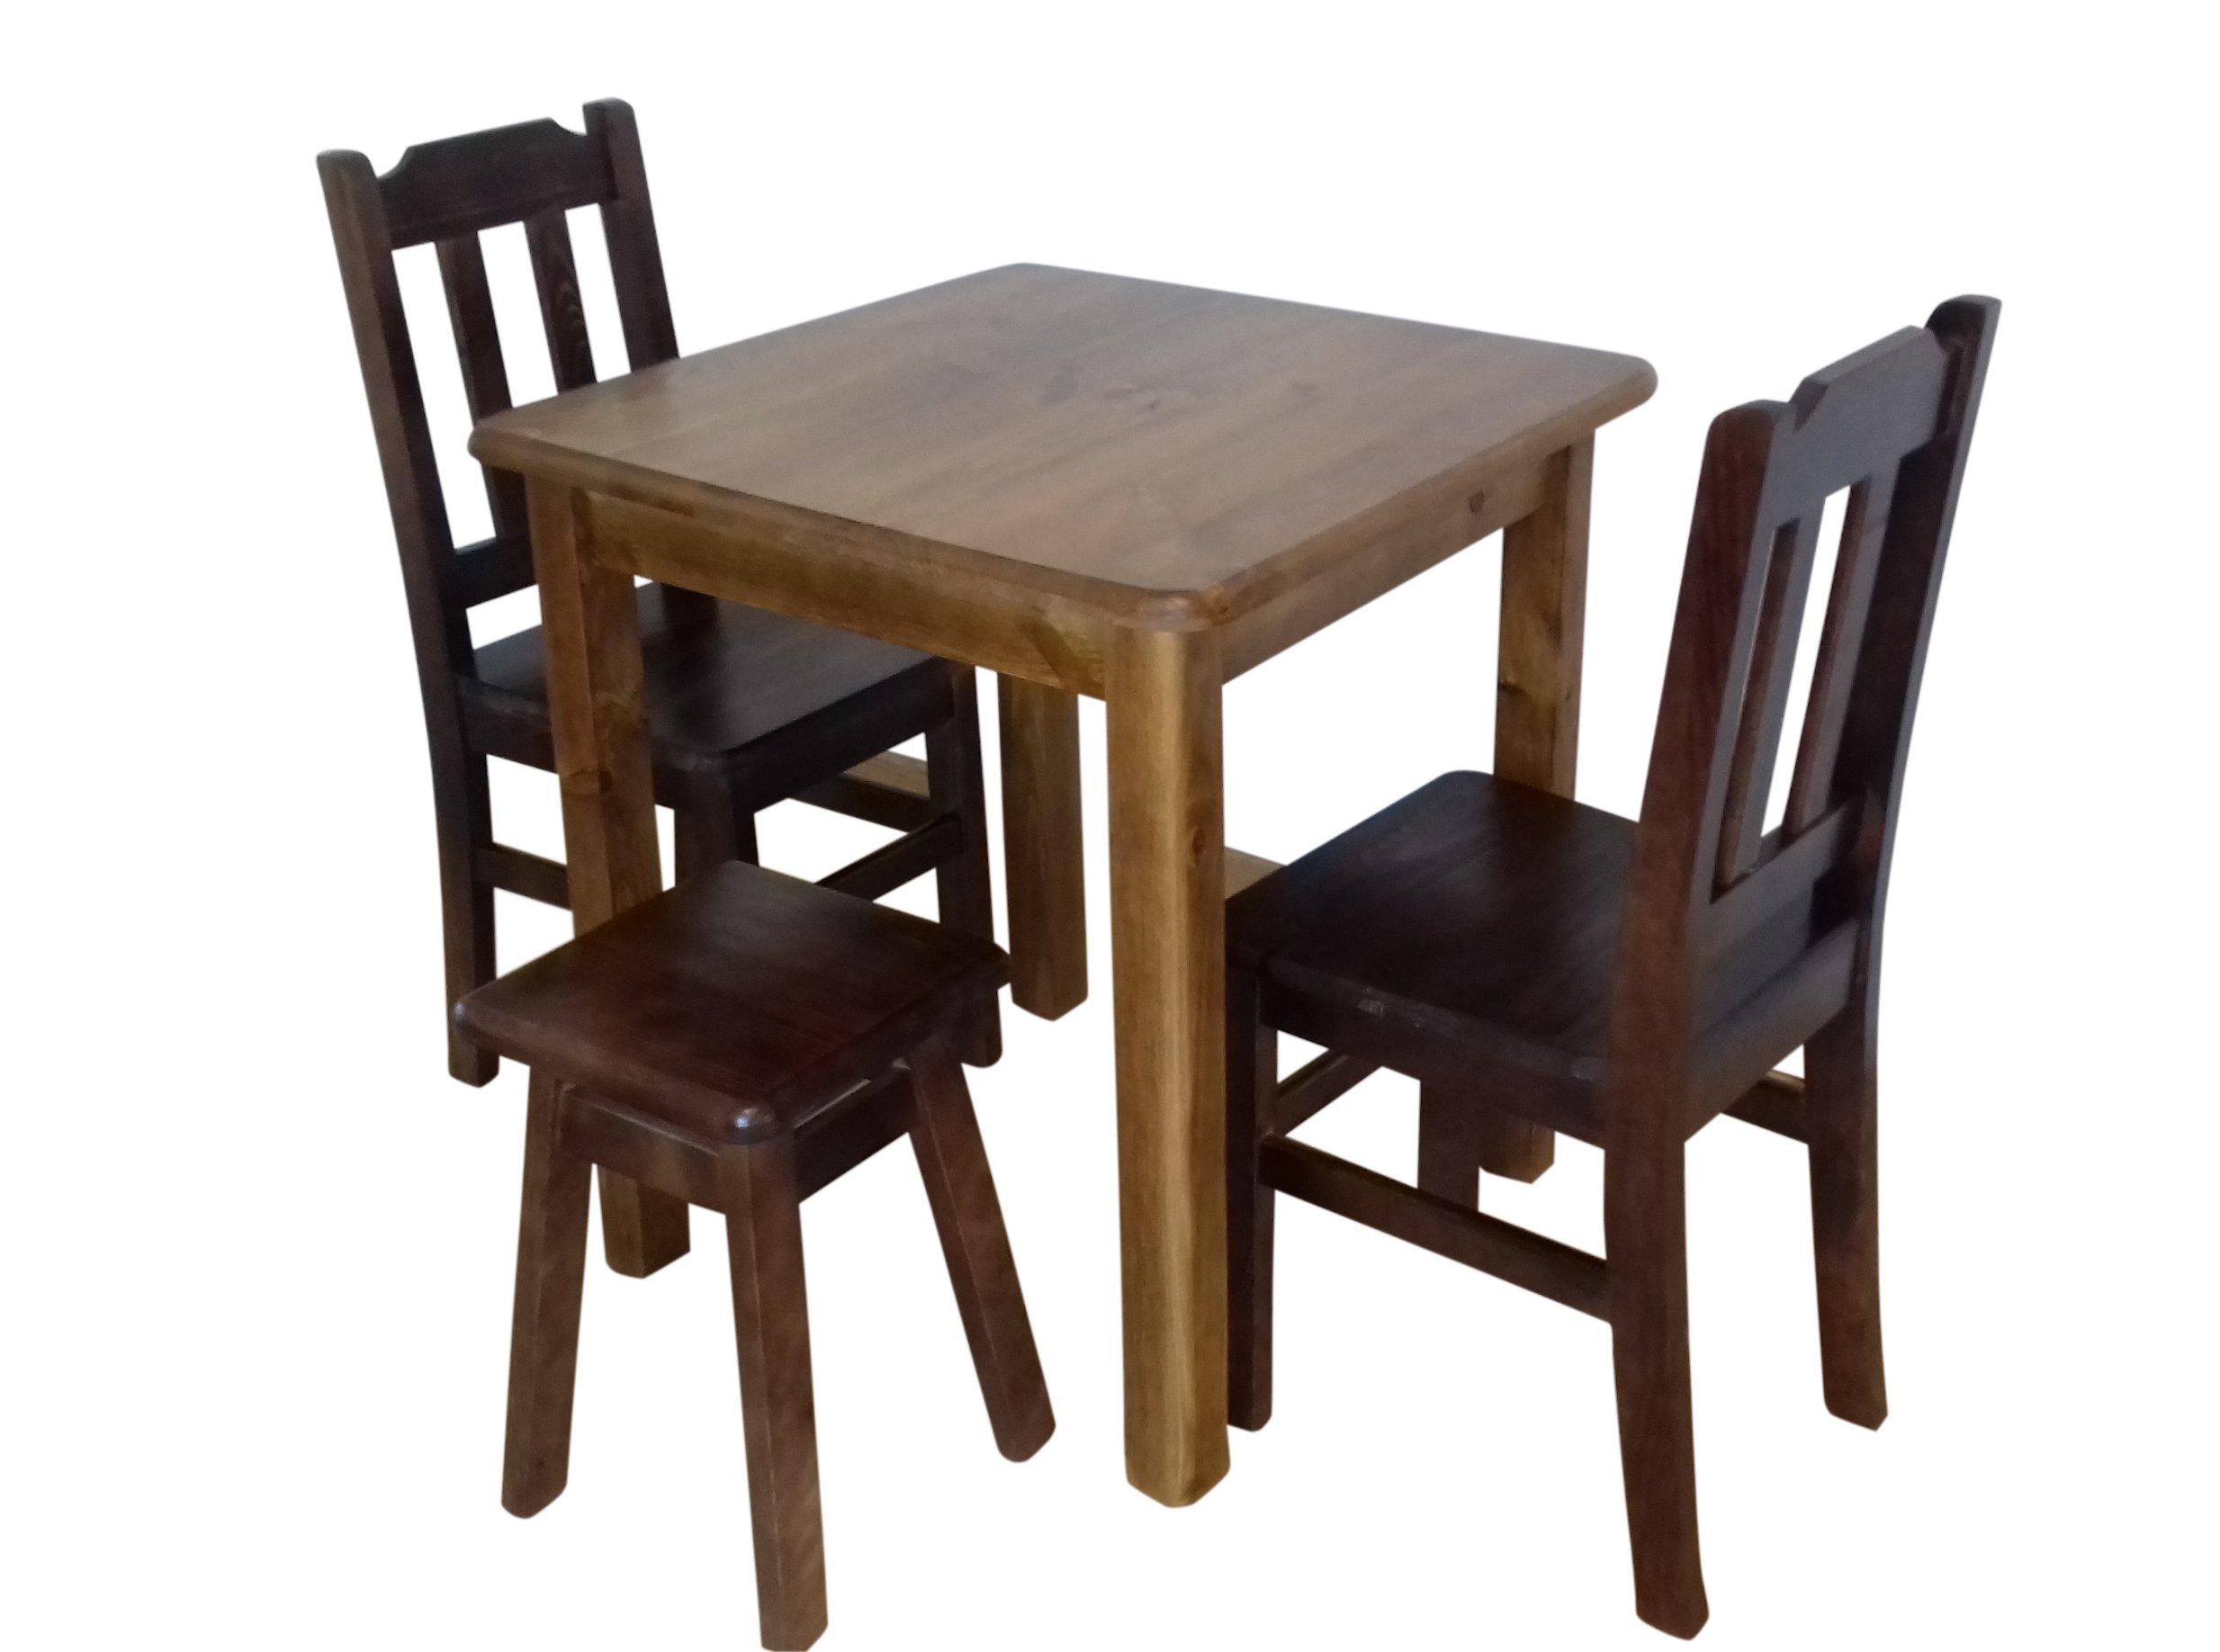 MASÍVNE kuchynský stôl 65x65 HOTEL pub, jedáleň, bar